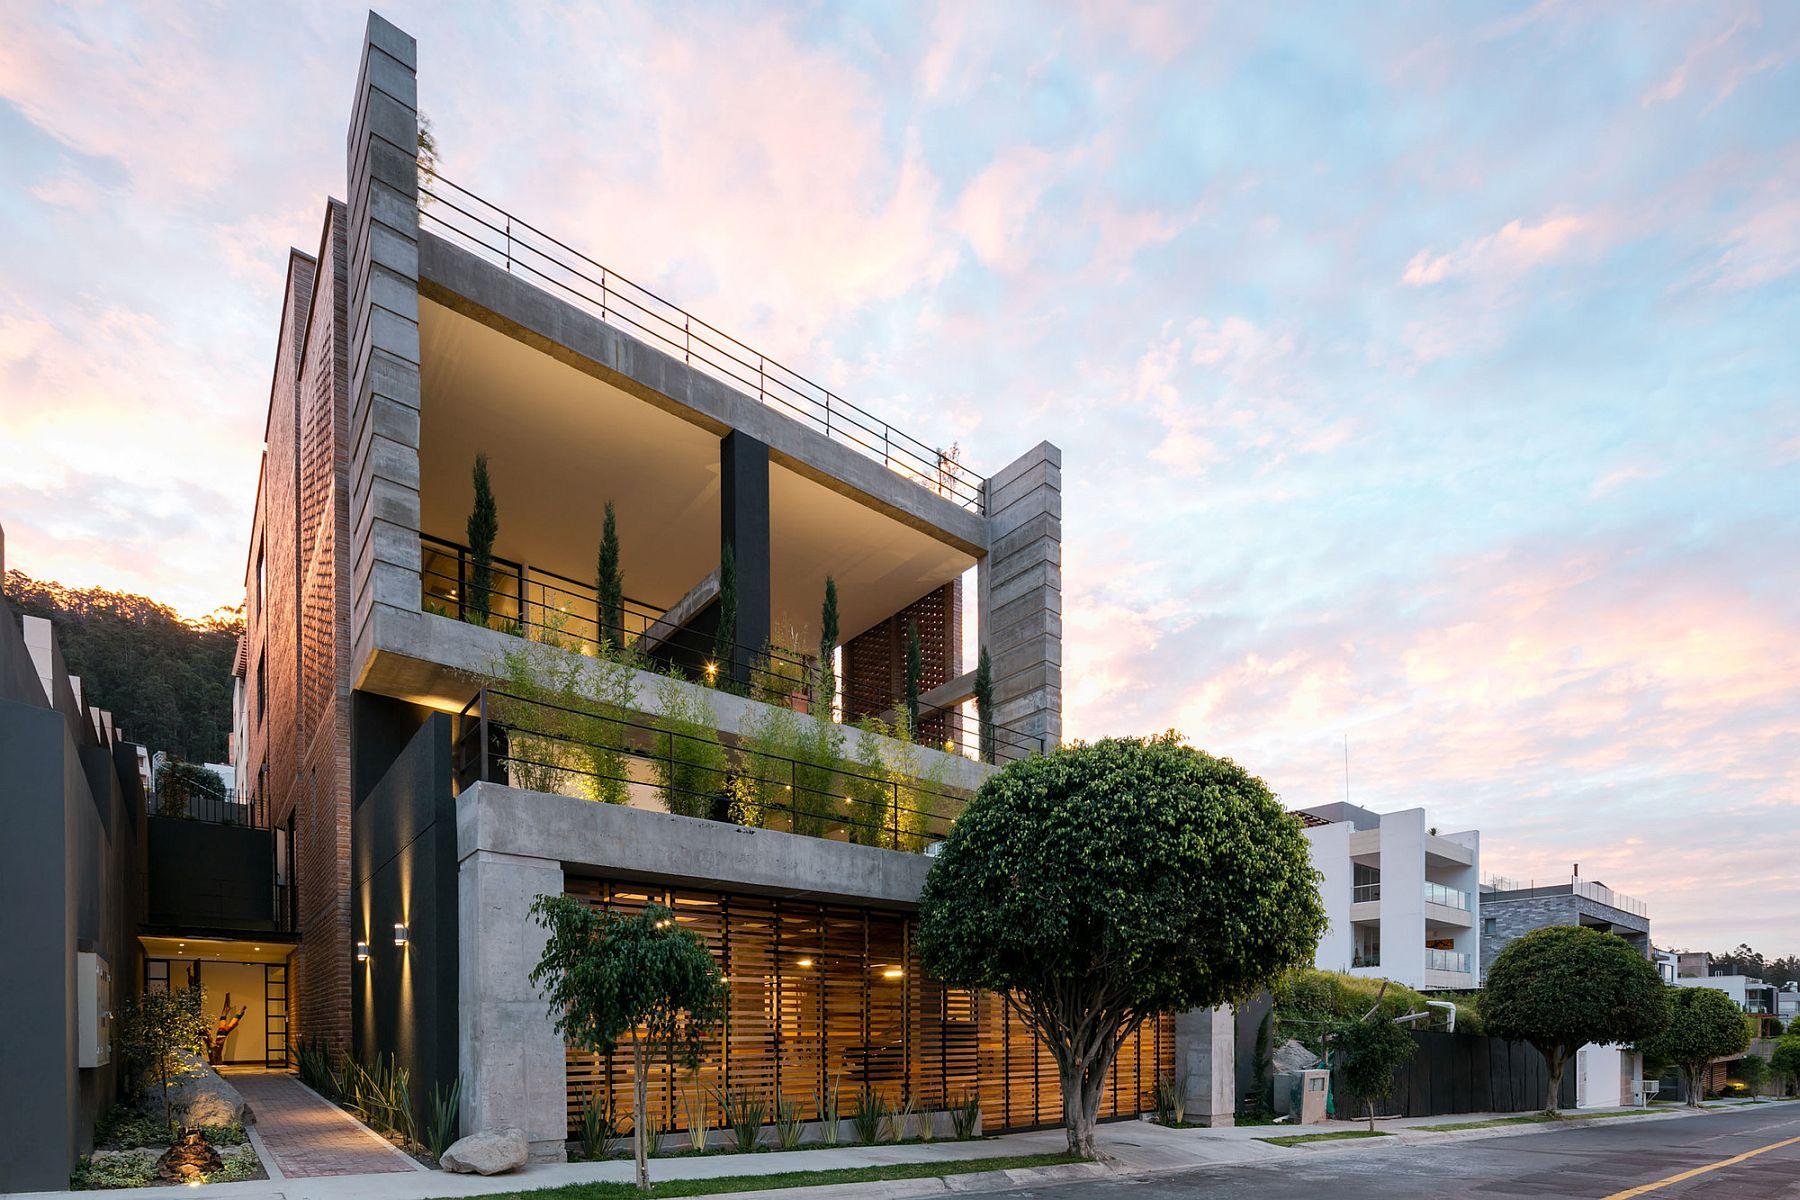 Apartment Building Zambeze by Juan Pablo Ribadeneira Mora